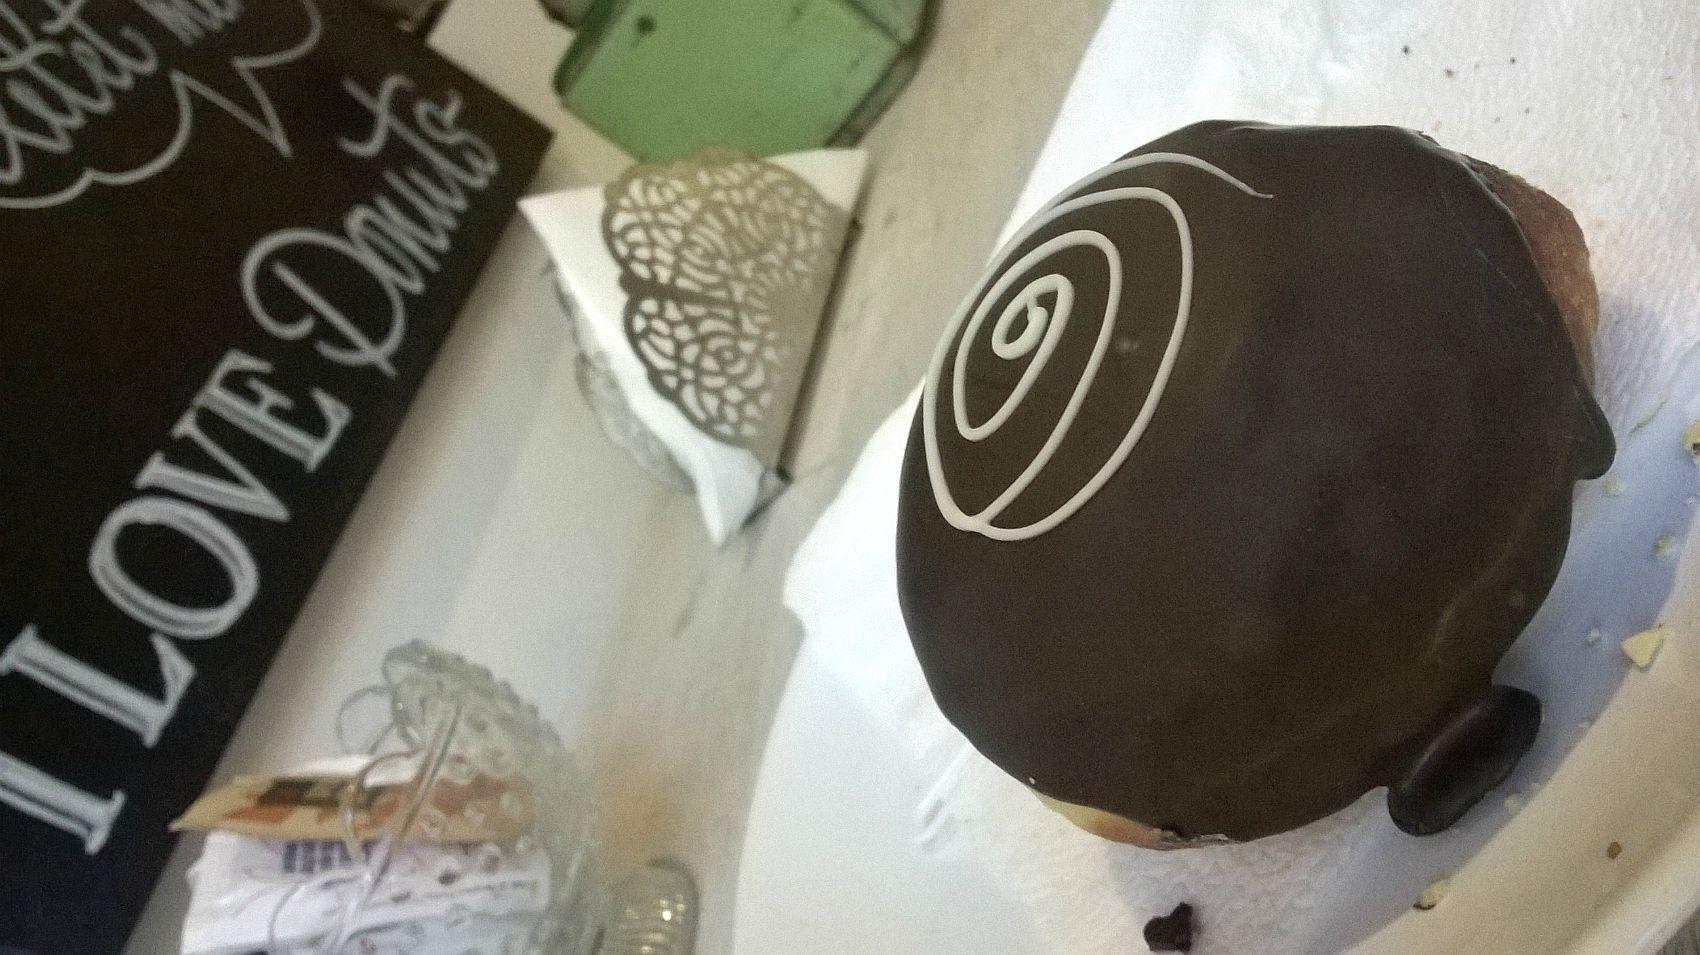 fanki_donut_boston